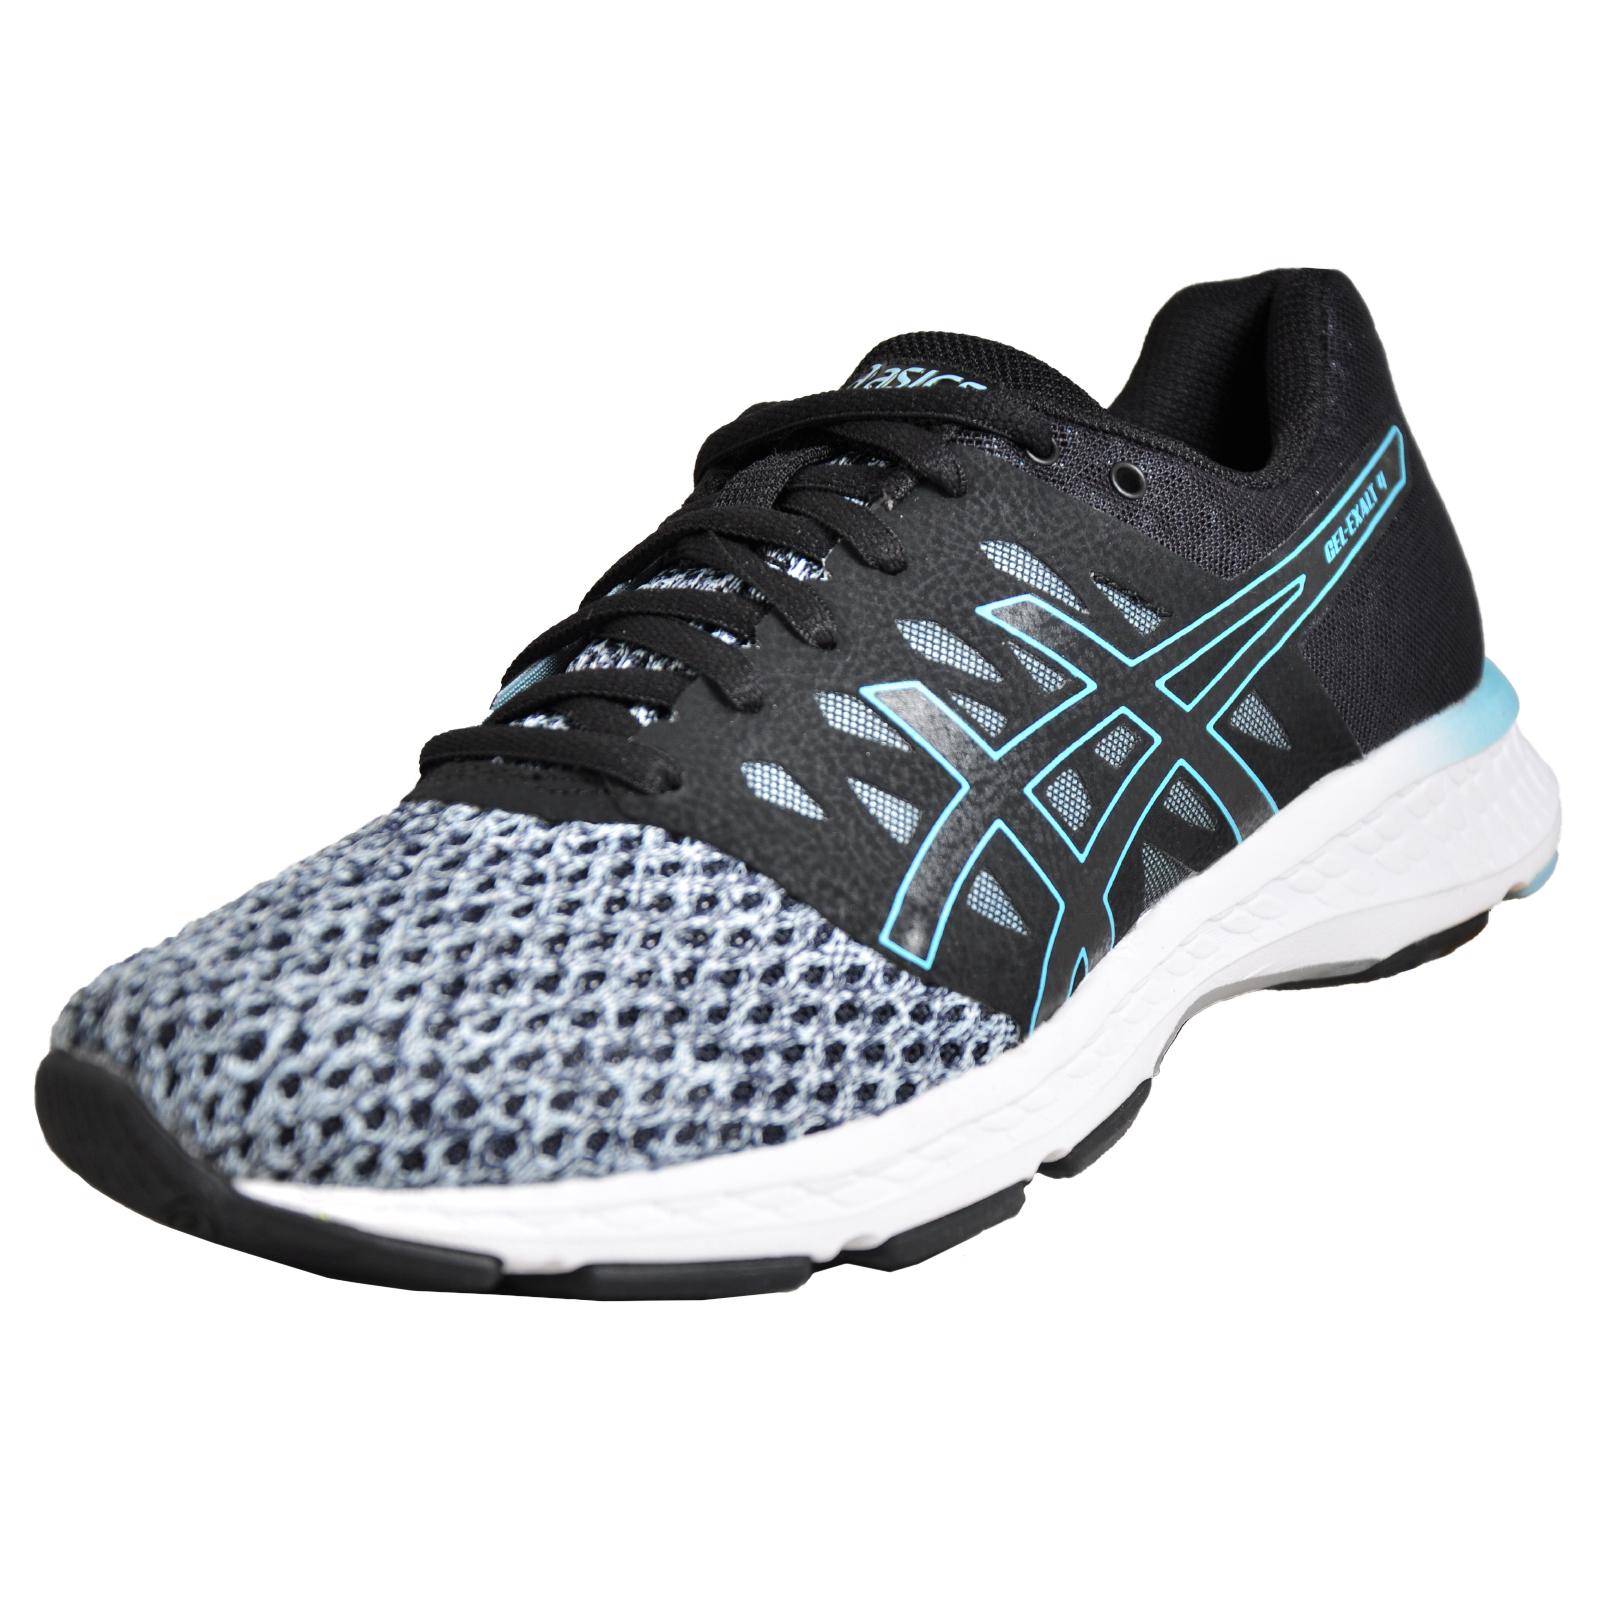 9421b6bf3ba Asics Gel Exalt 4 Womens Premium Running Shoes Fitness Gym Trainers Black